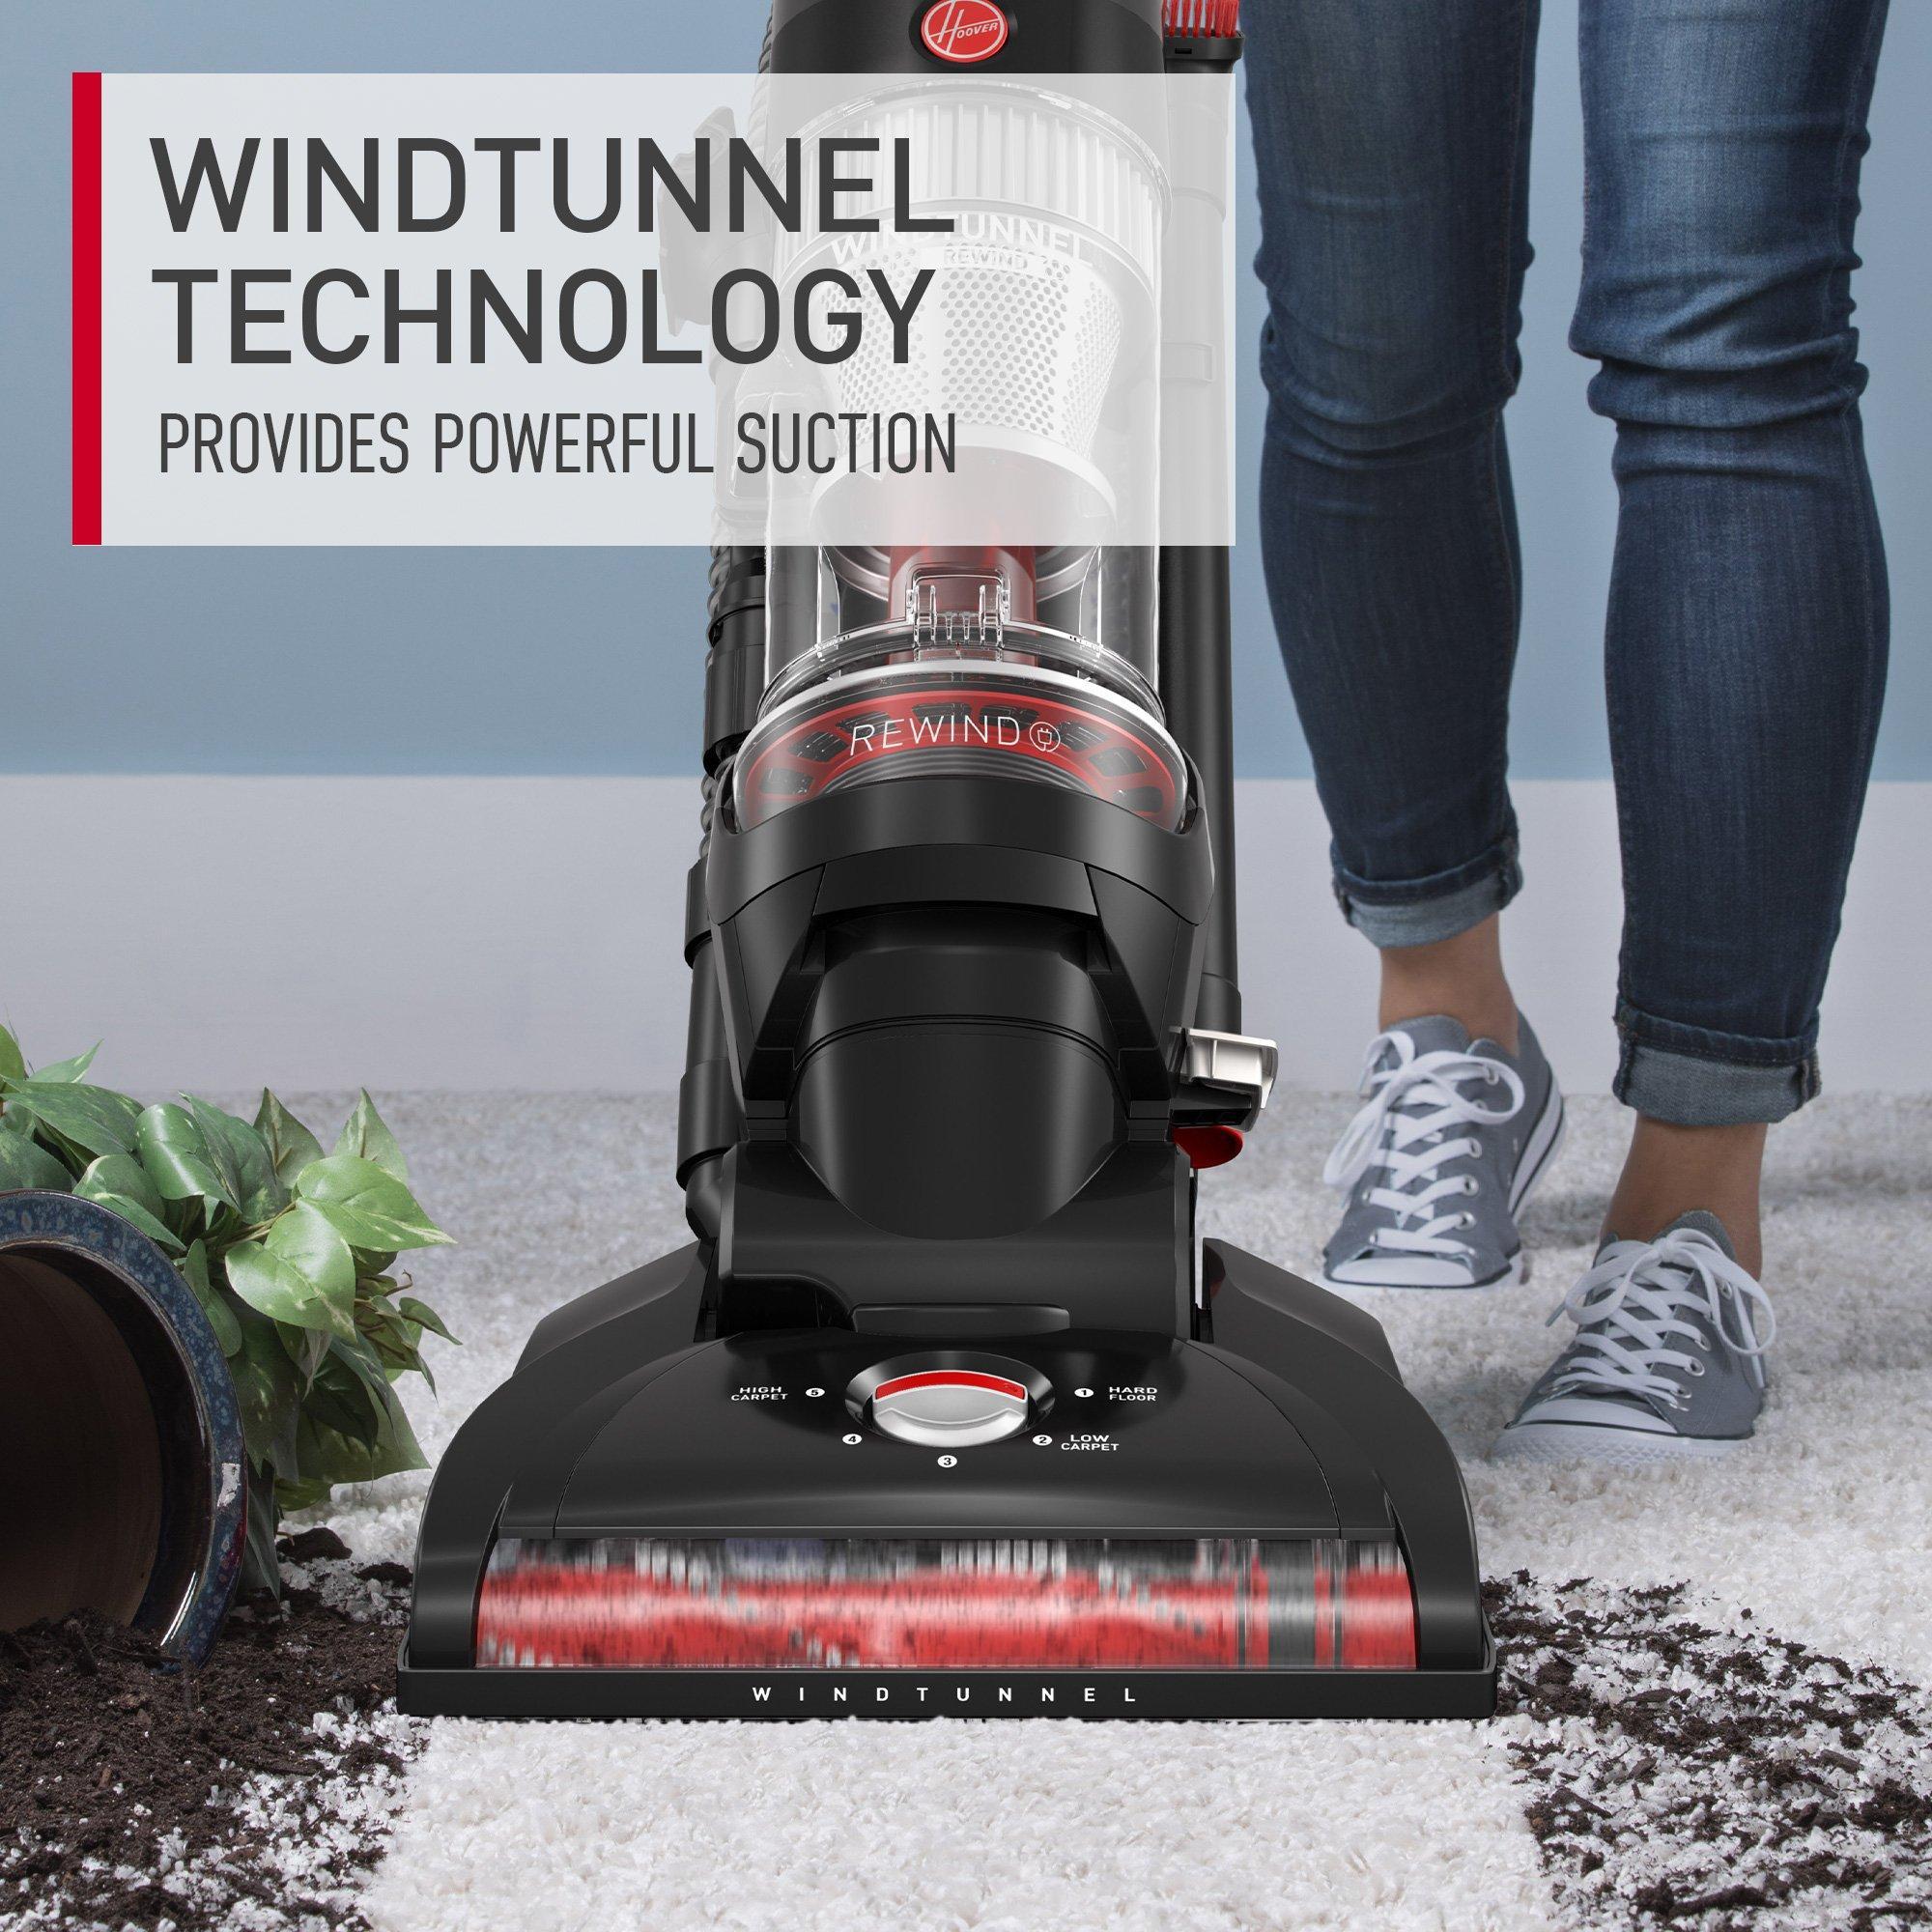 WindTunnel Cord Rewind Pro5